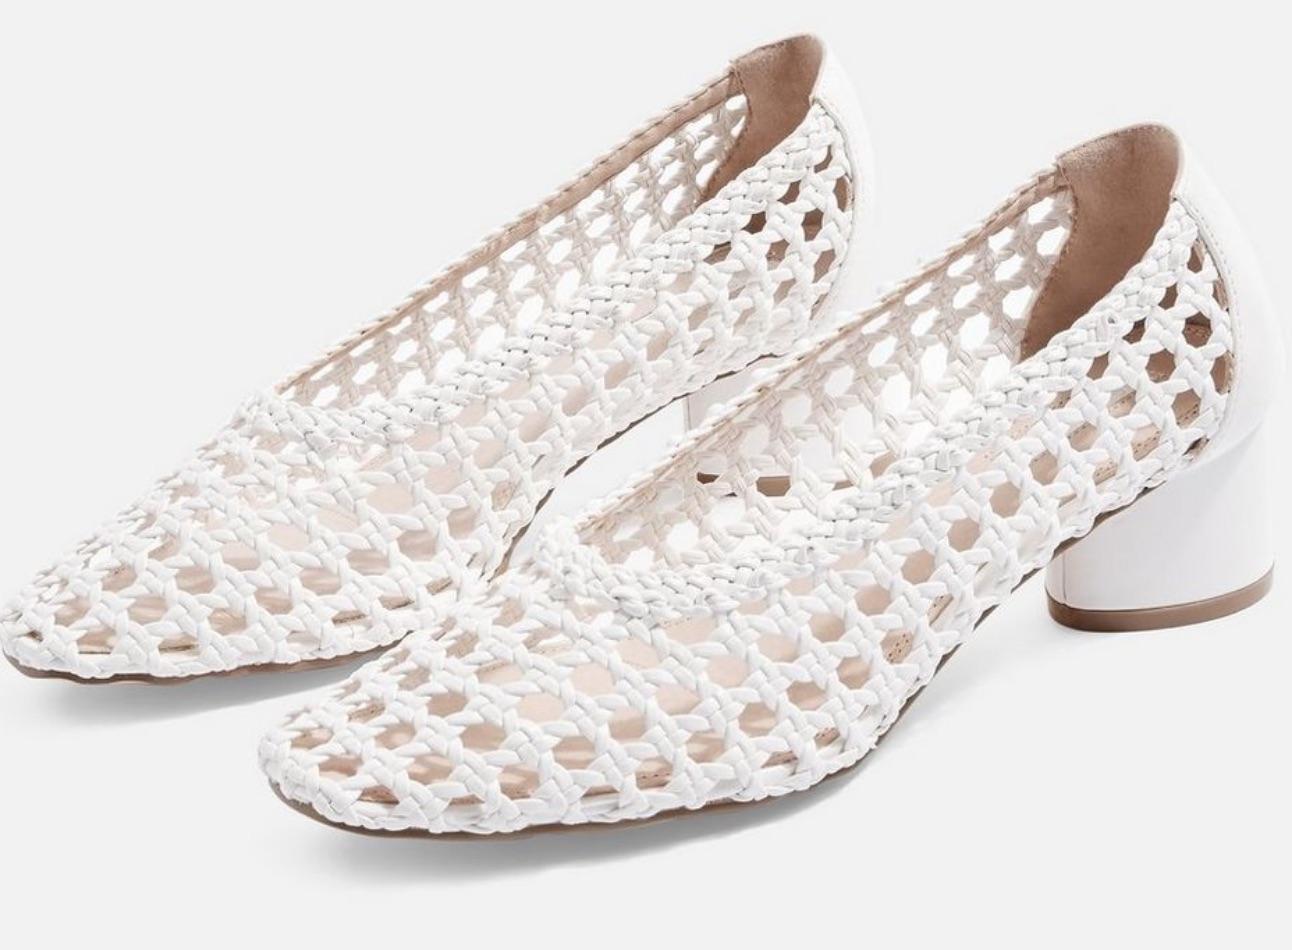 Topshop Raffia White Shoes